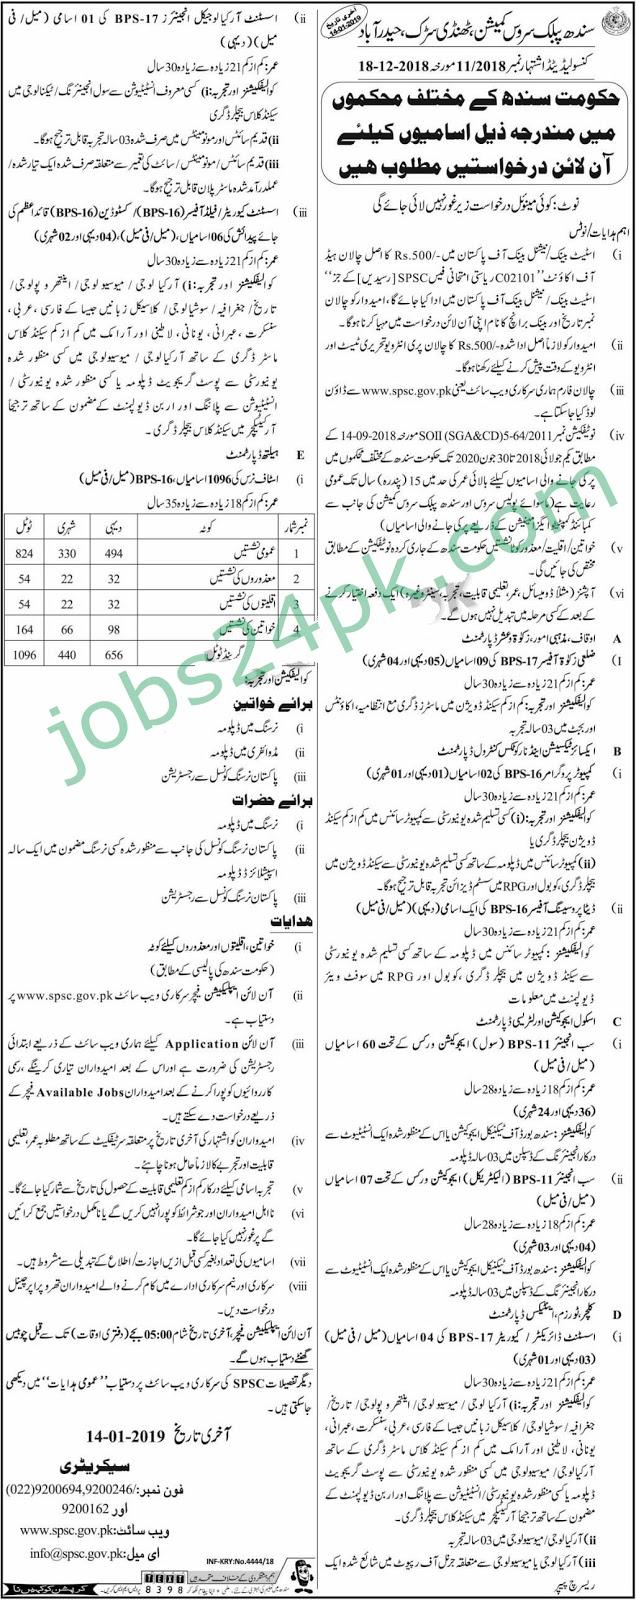 Sindh Public Service Commission (SPSC) 2019 Jobs-1186 vacancies Apply online  now